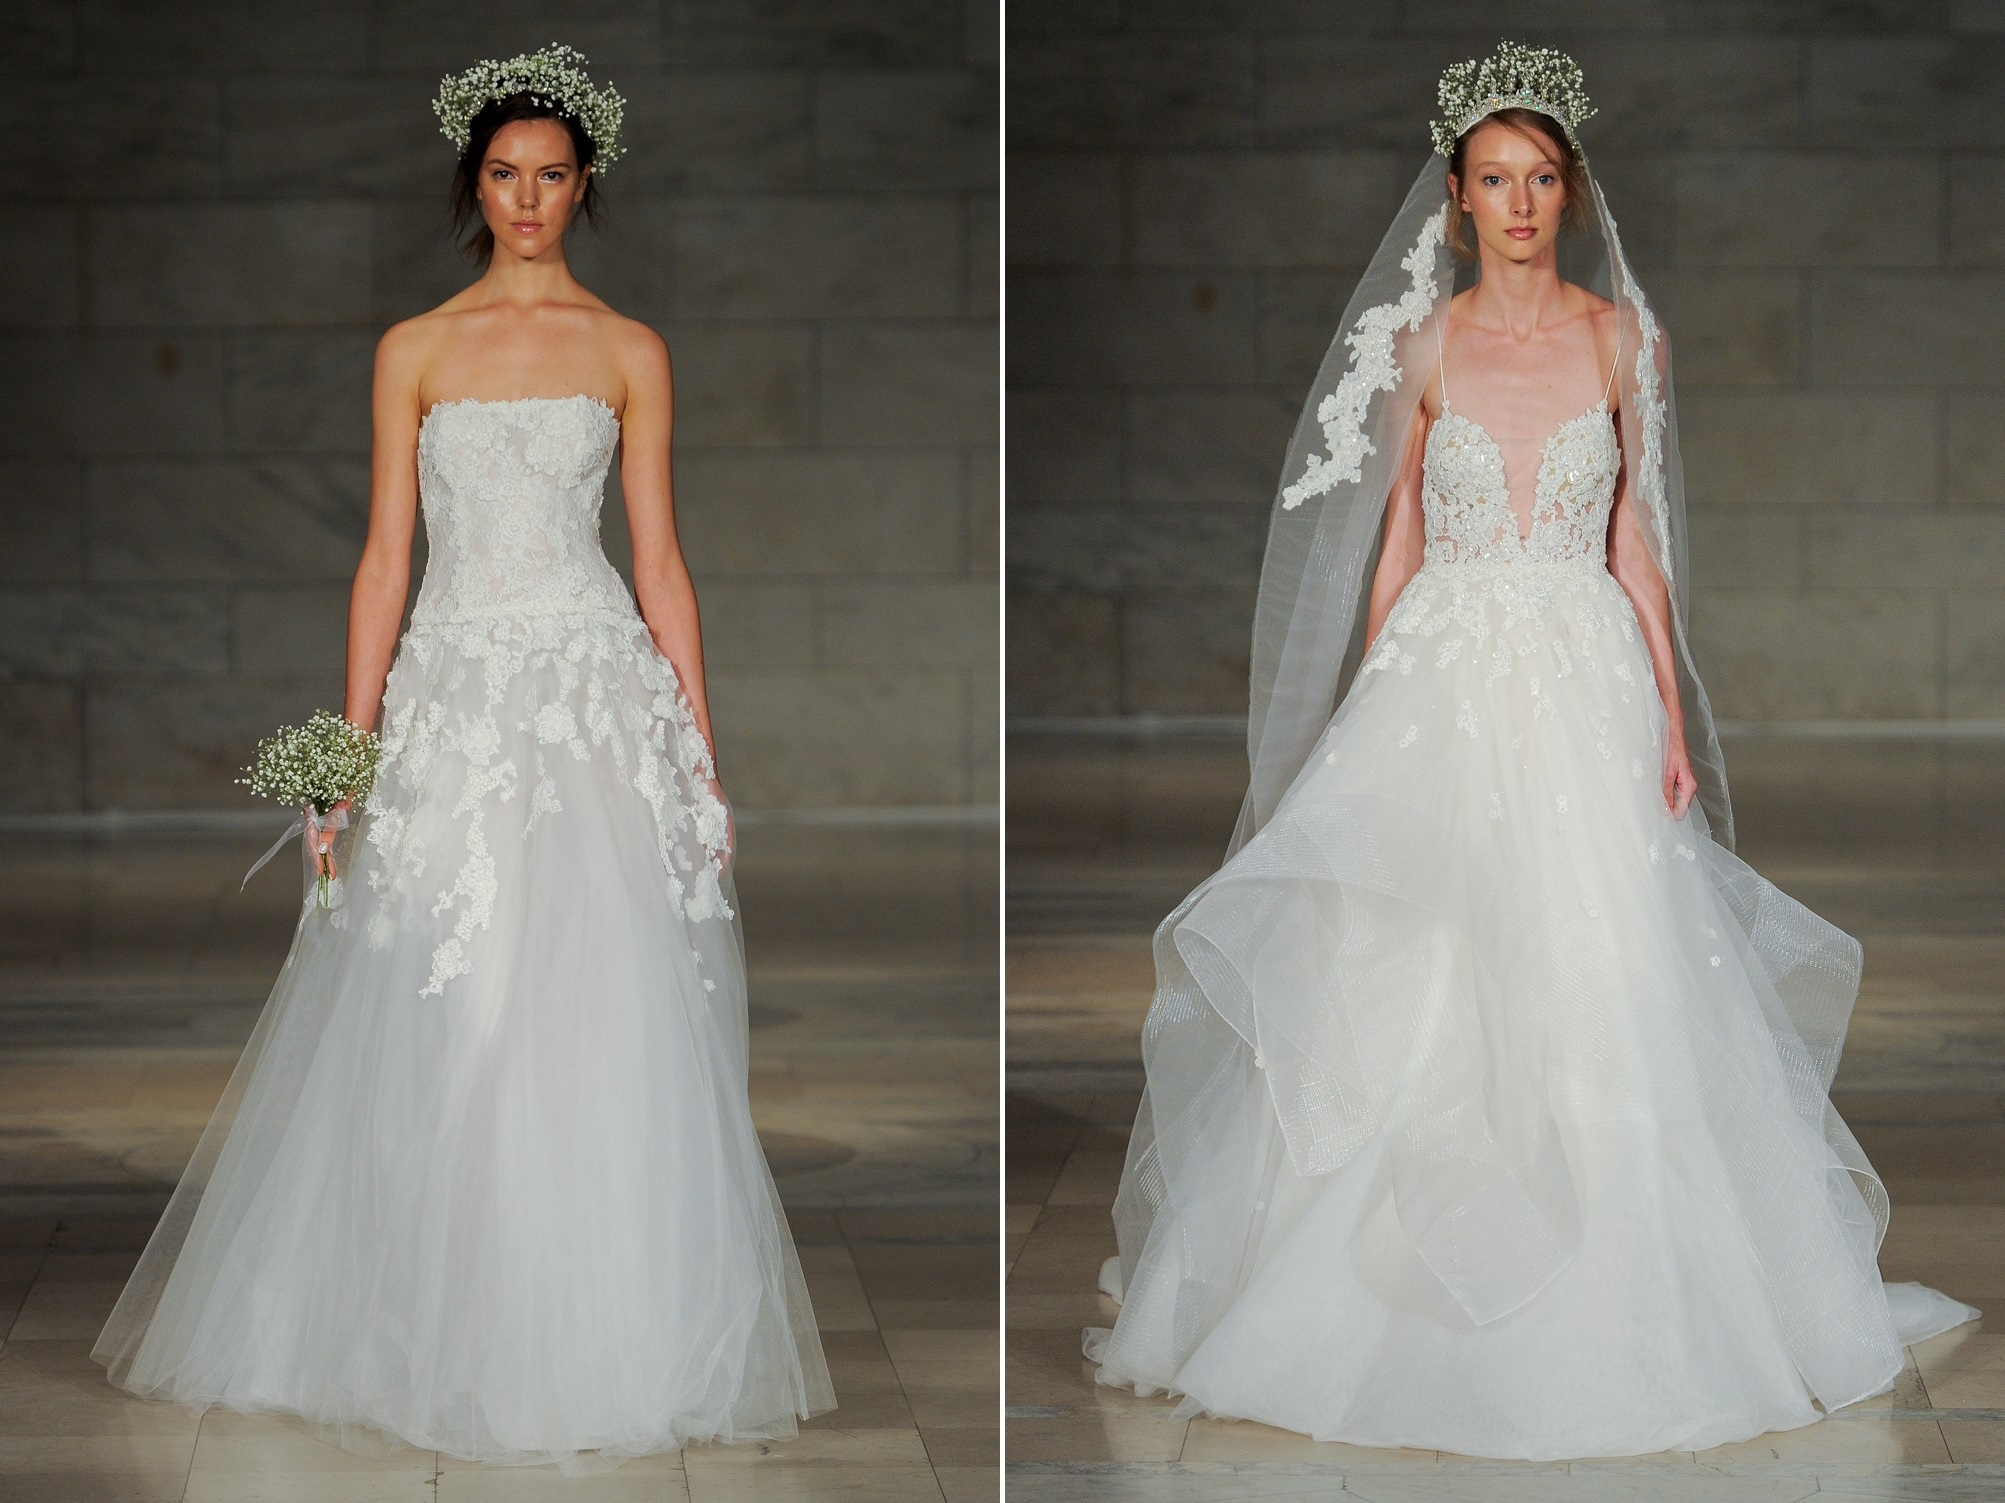 Reem Acra's 2018 Bridal Collection